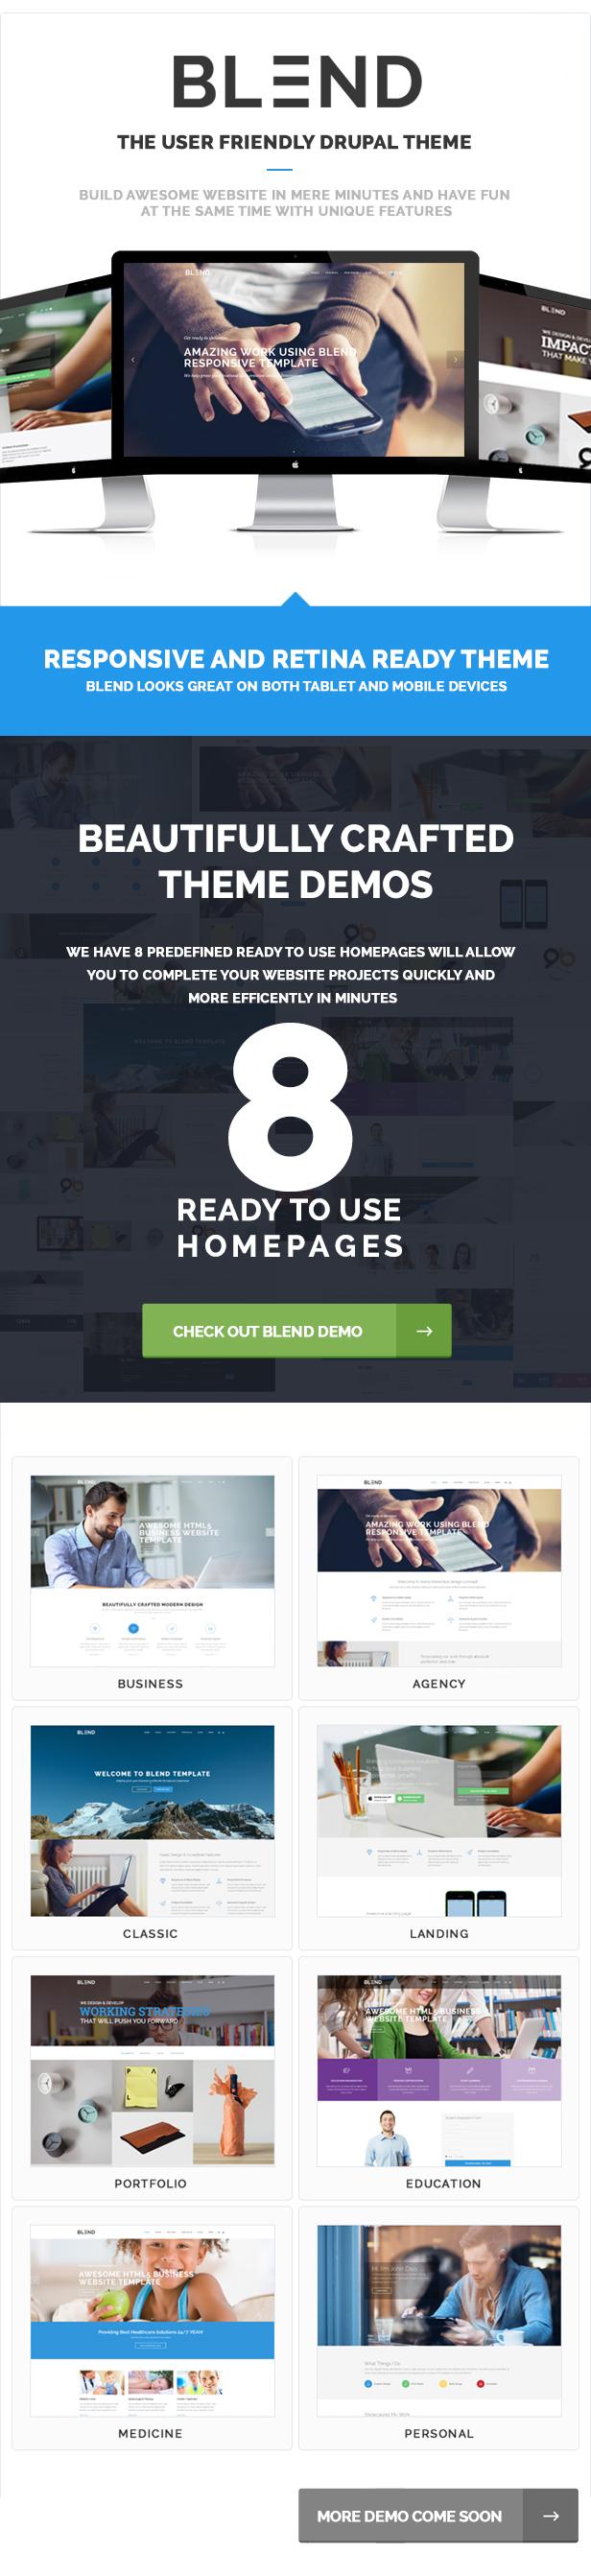 product - Blend - Multi-Purpose eCommerce Drupal Theme